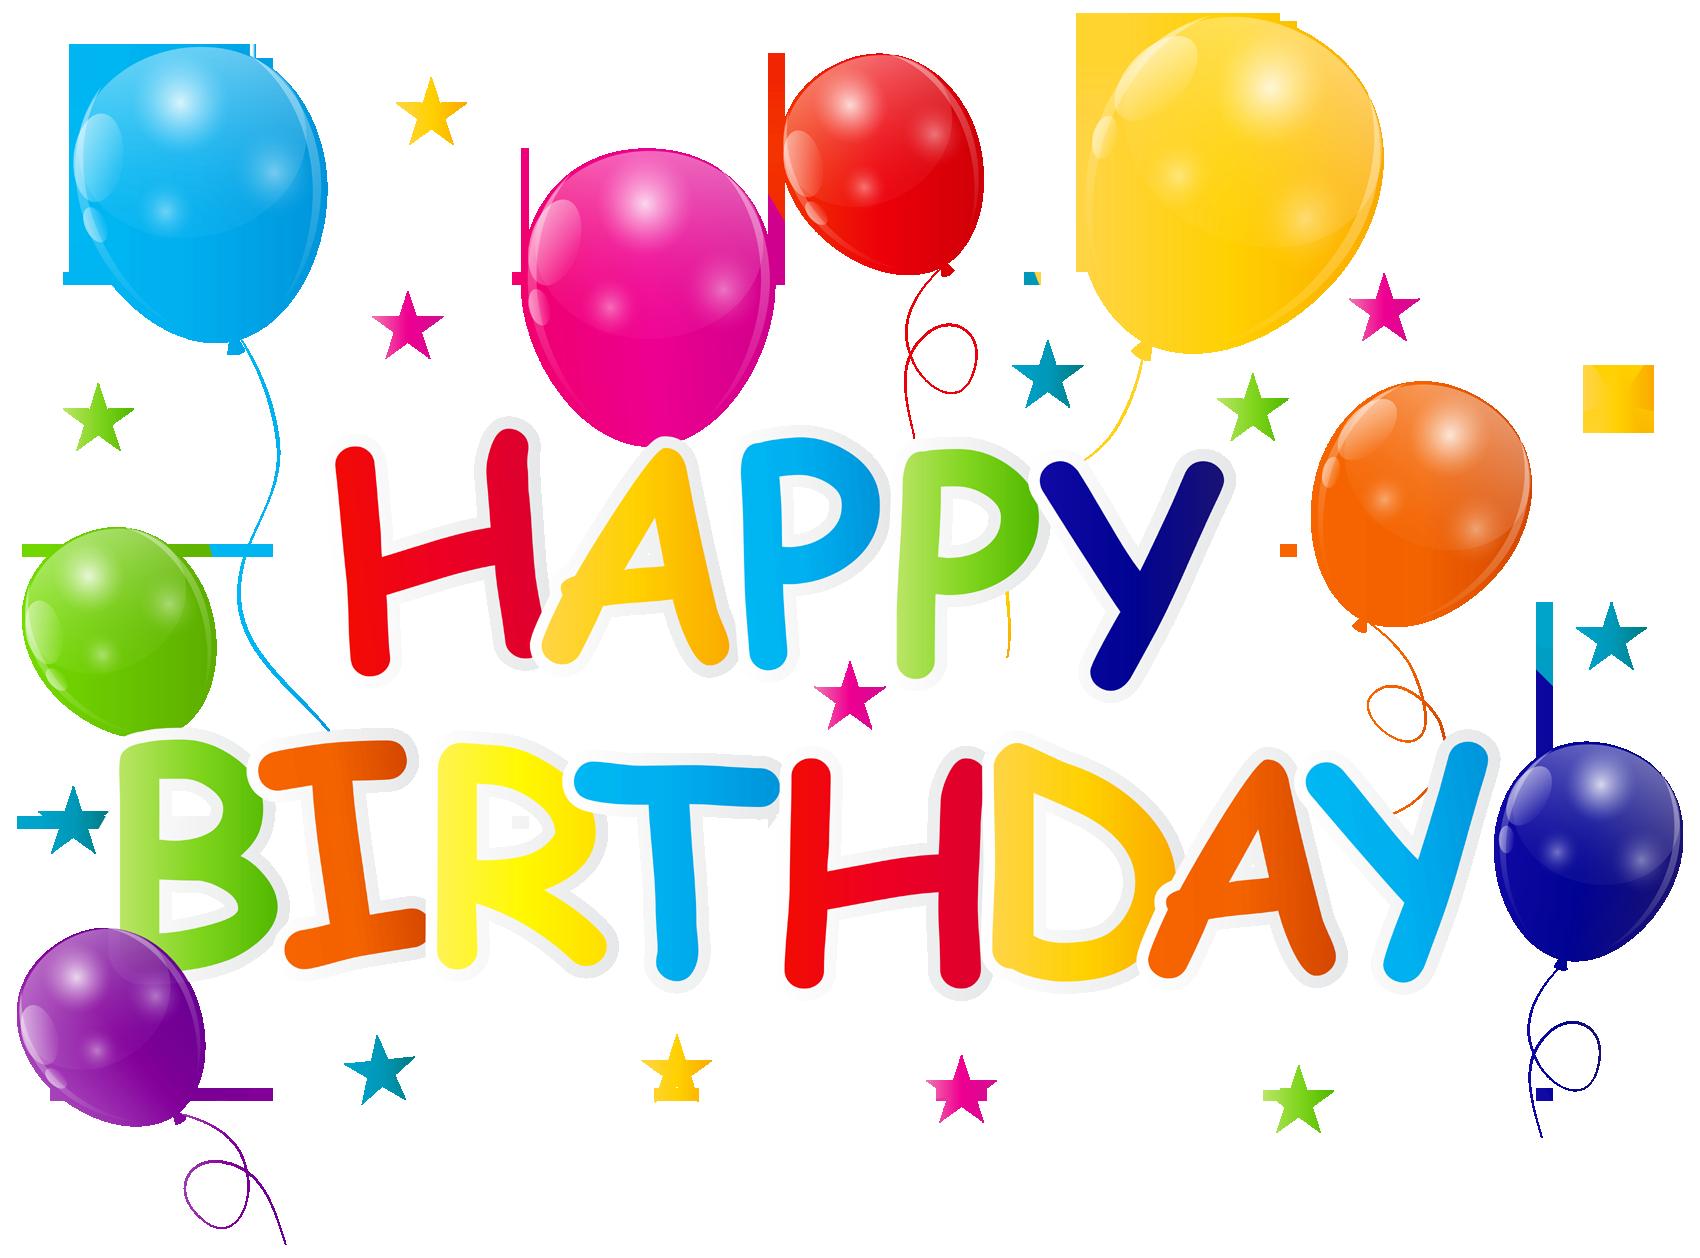 Happy text art design. Clipart birthday transparent background